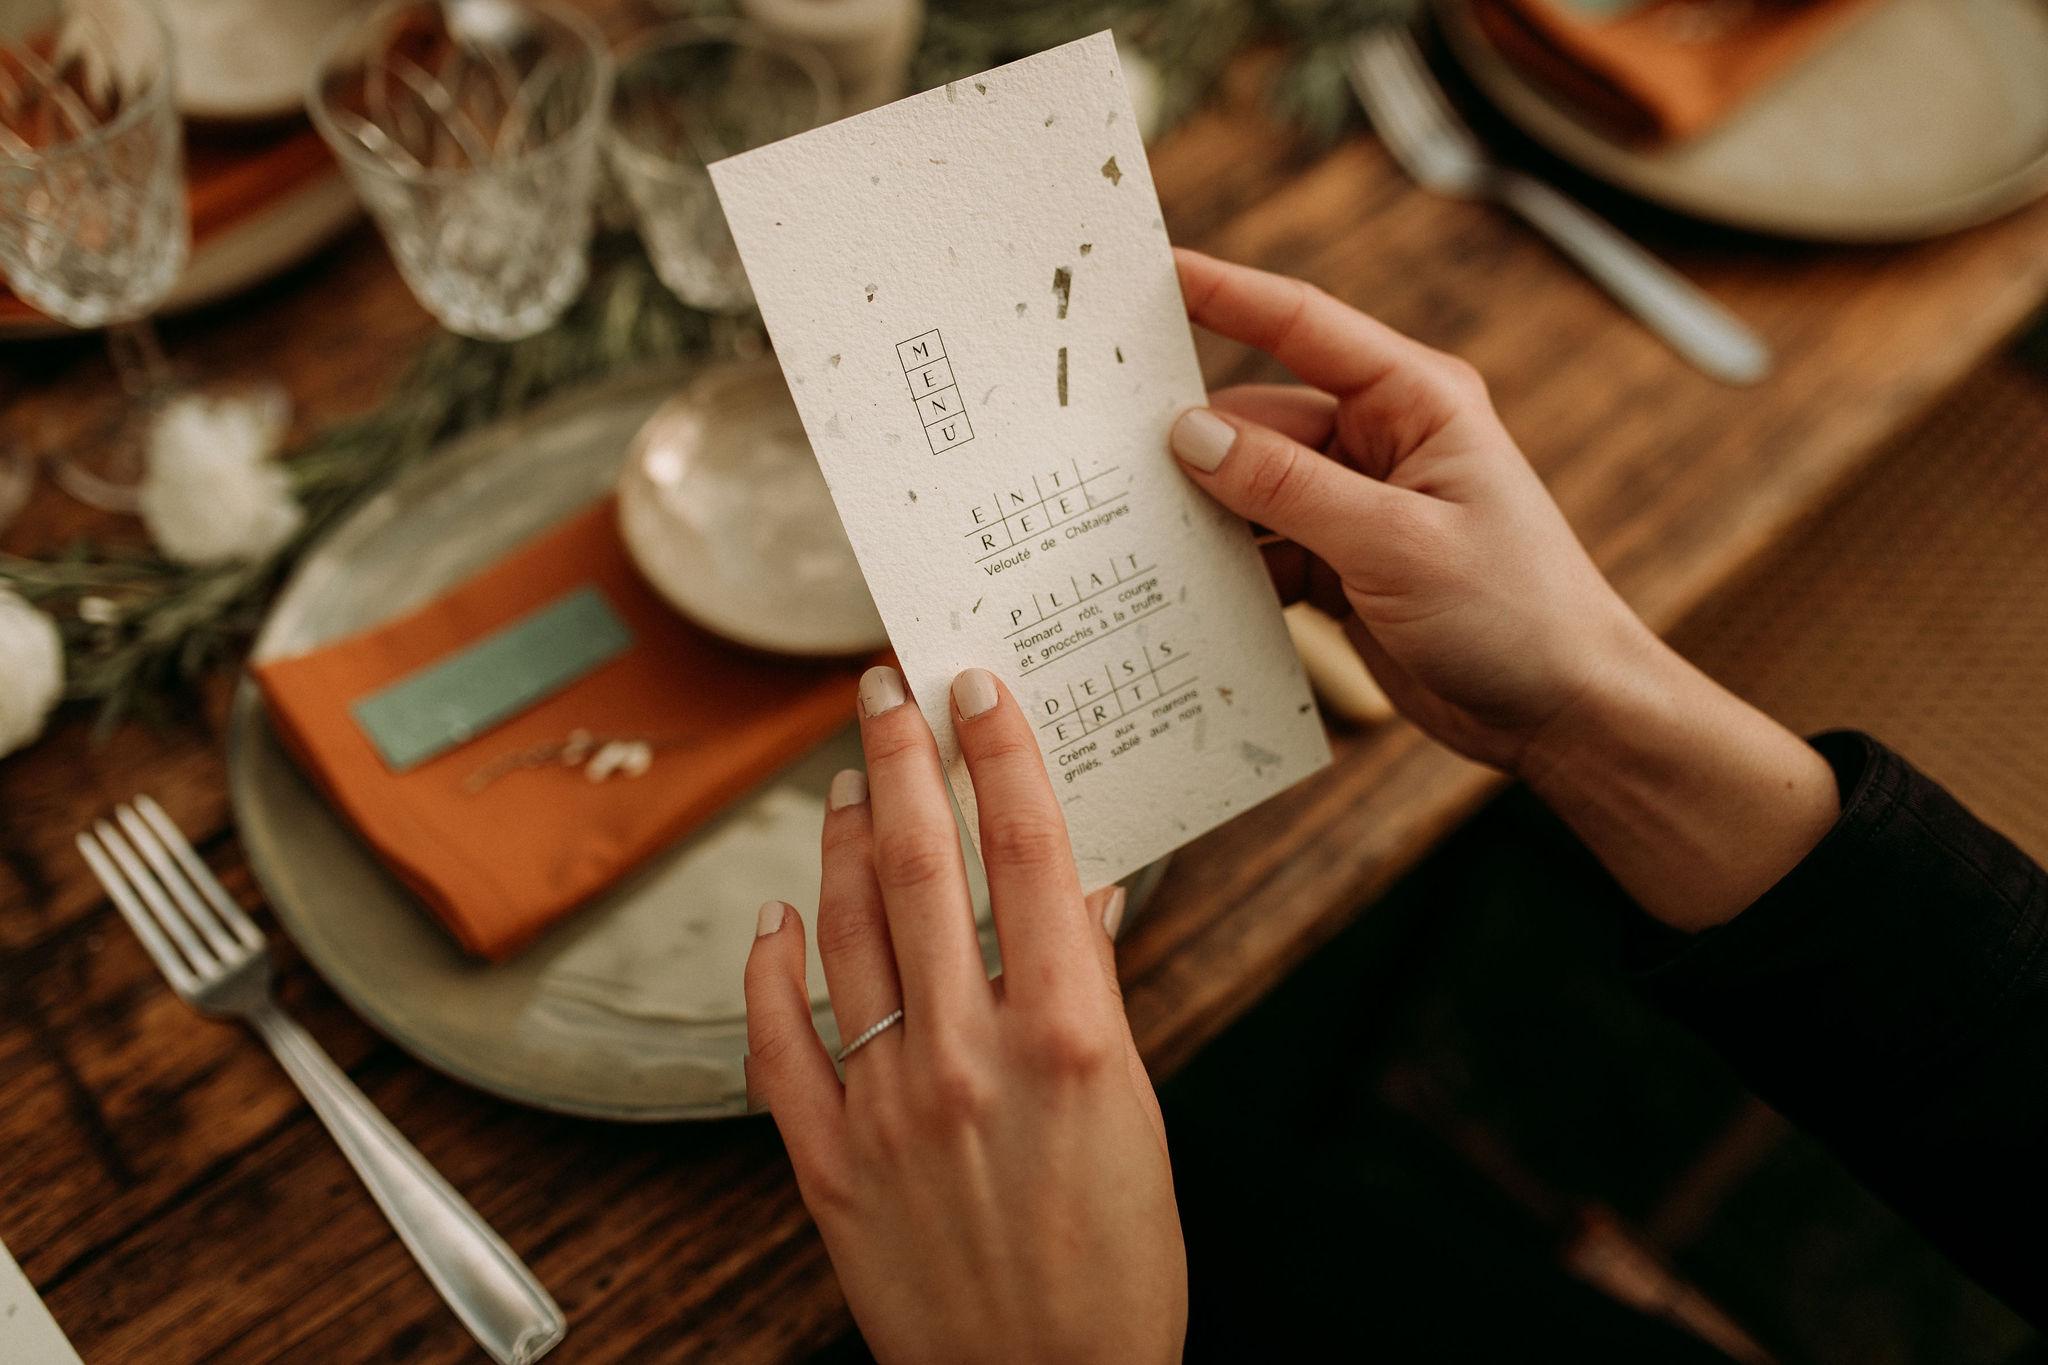 Domaine verderonne mariage menu